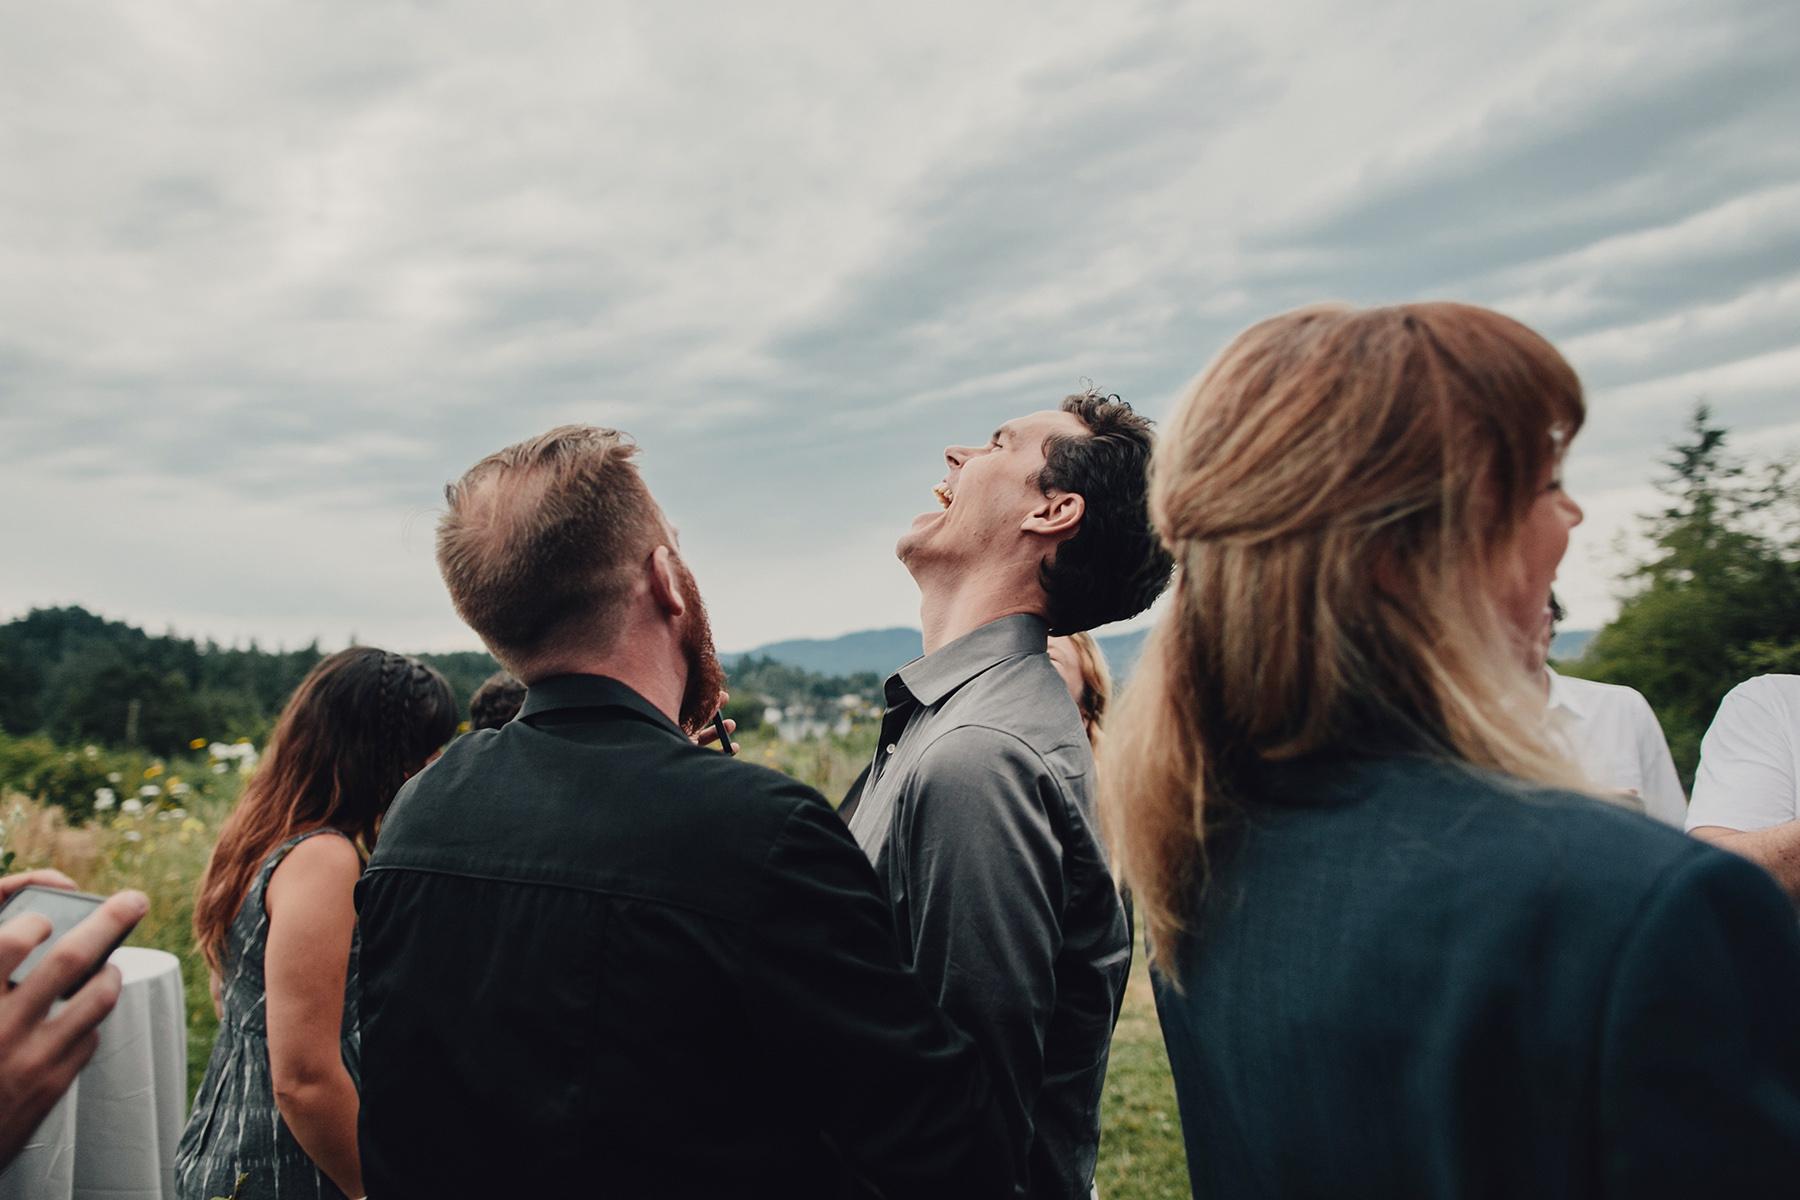 kildara-farms-wedding-photo-inspiration-0097